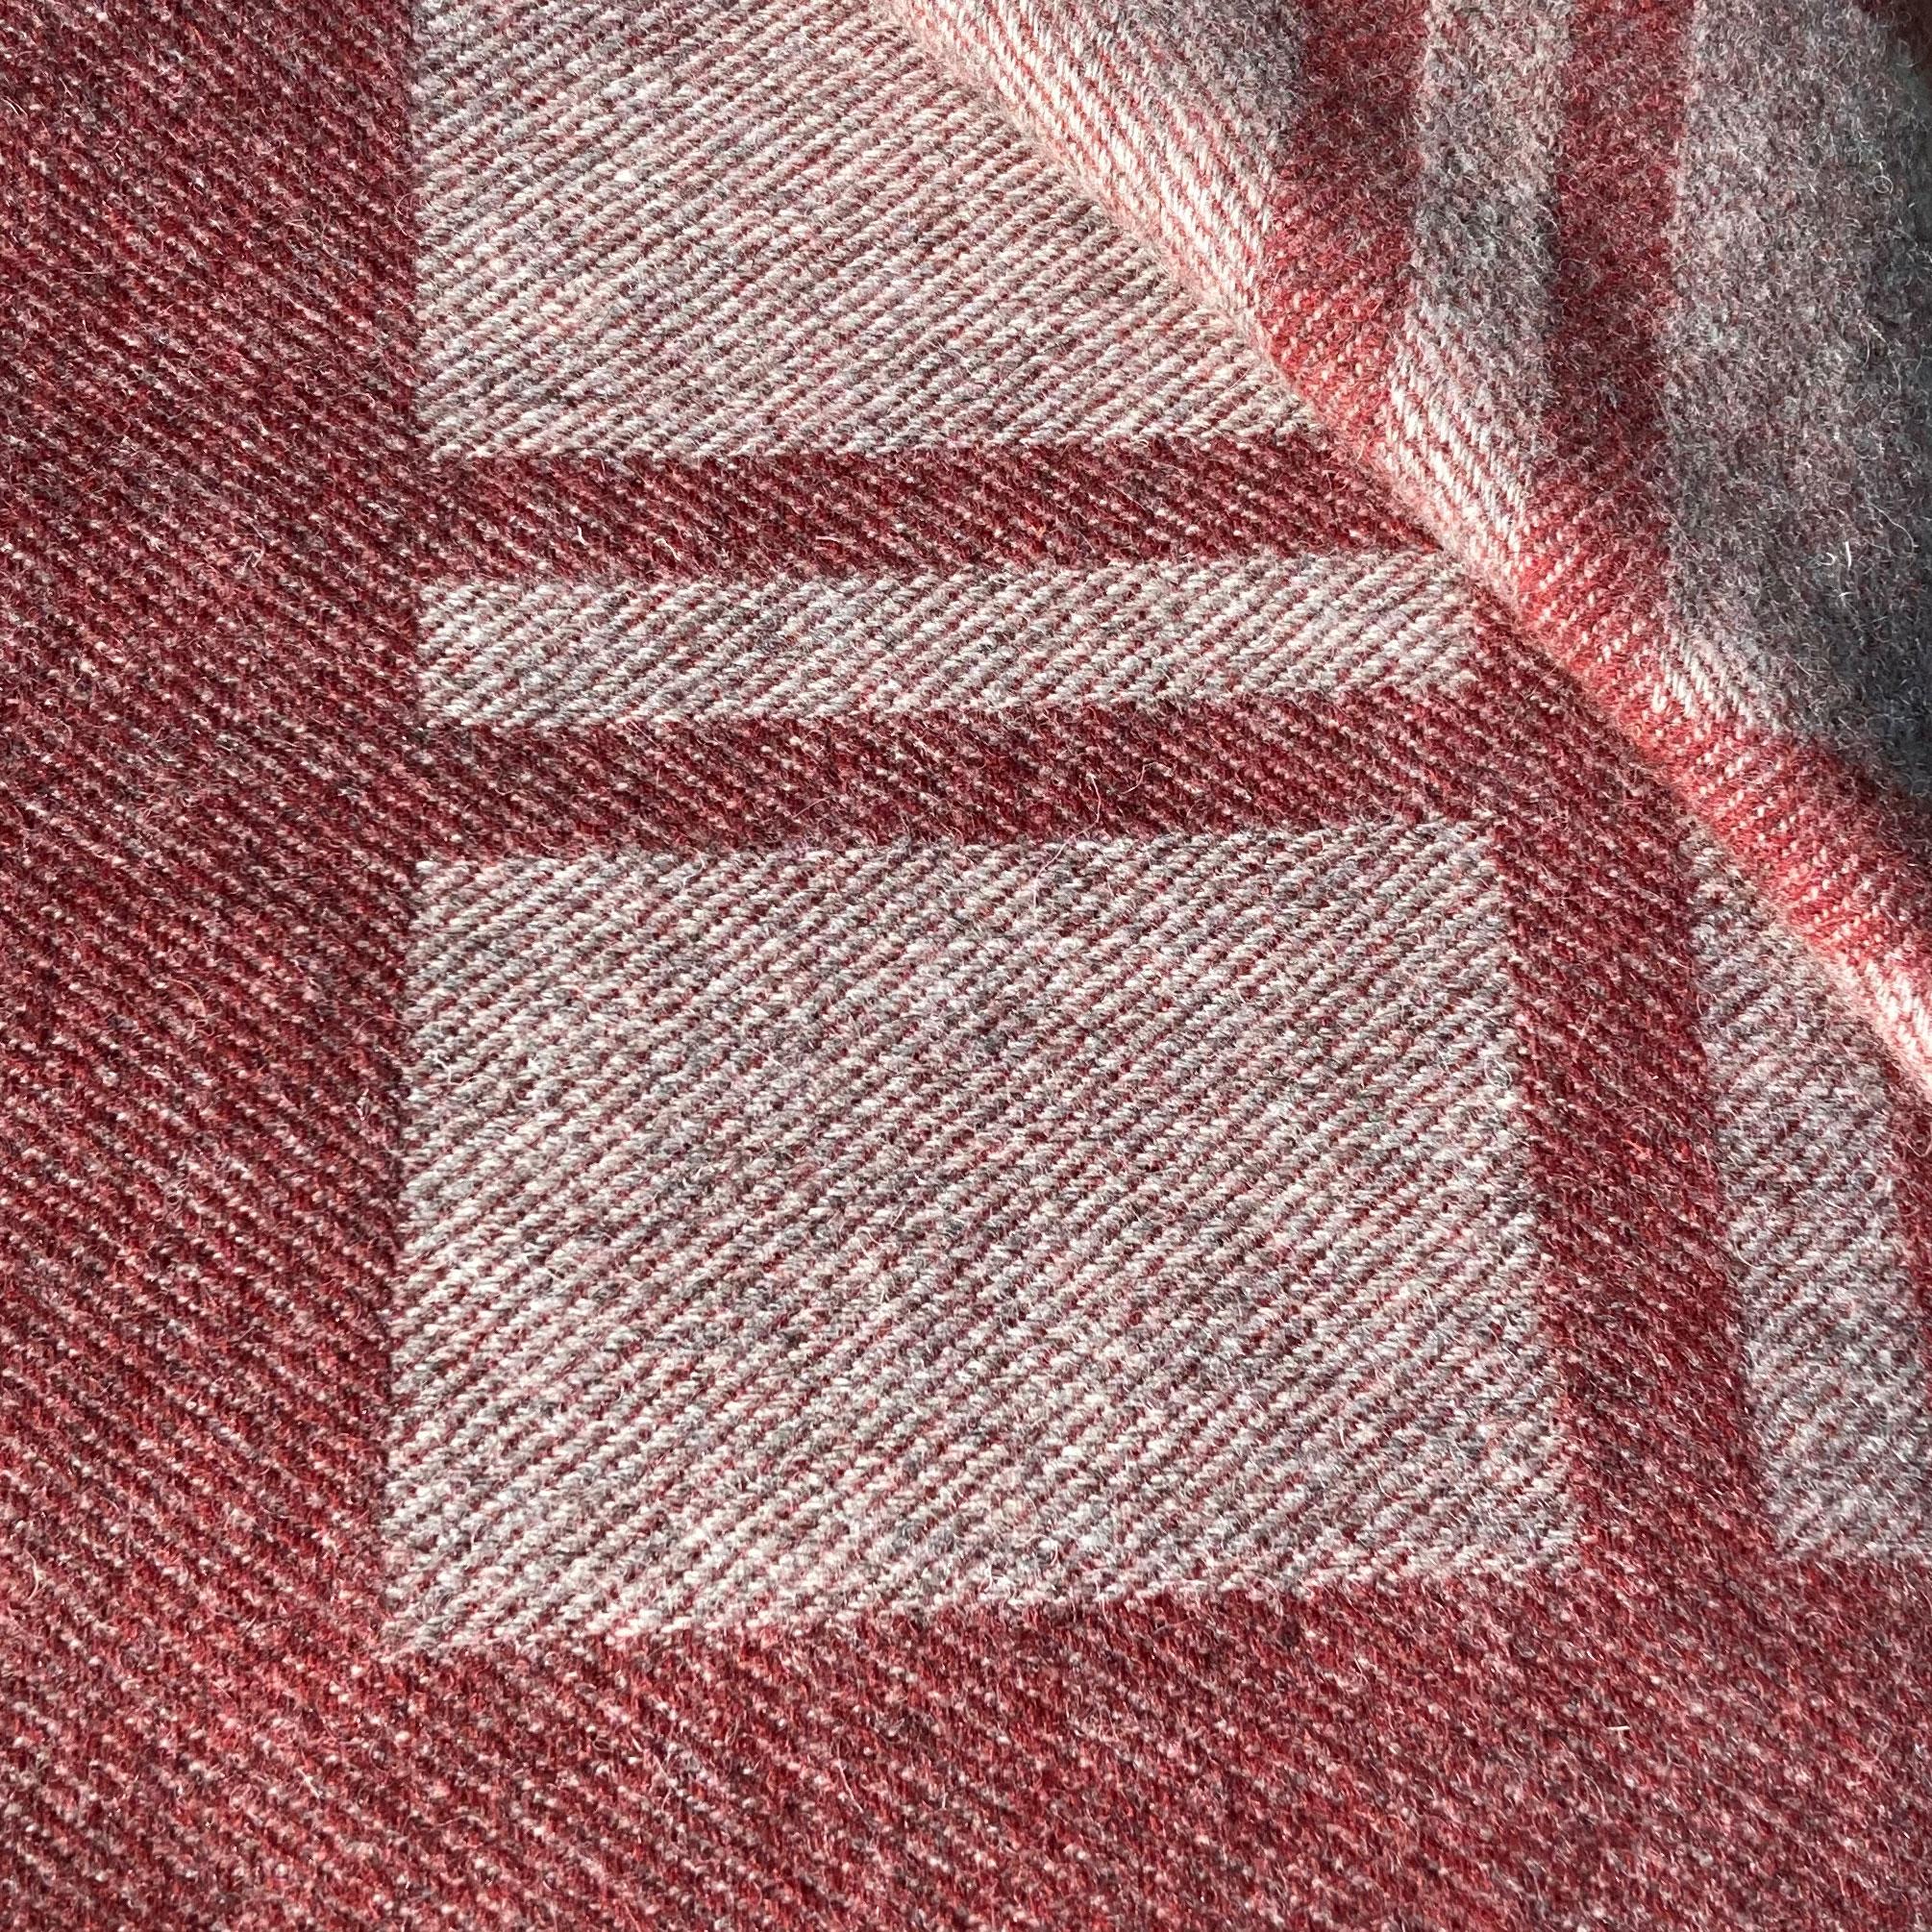 Laura's Loom, Cumbrian Summer, Blanket, Great Burnet